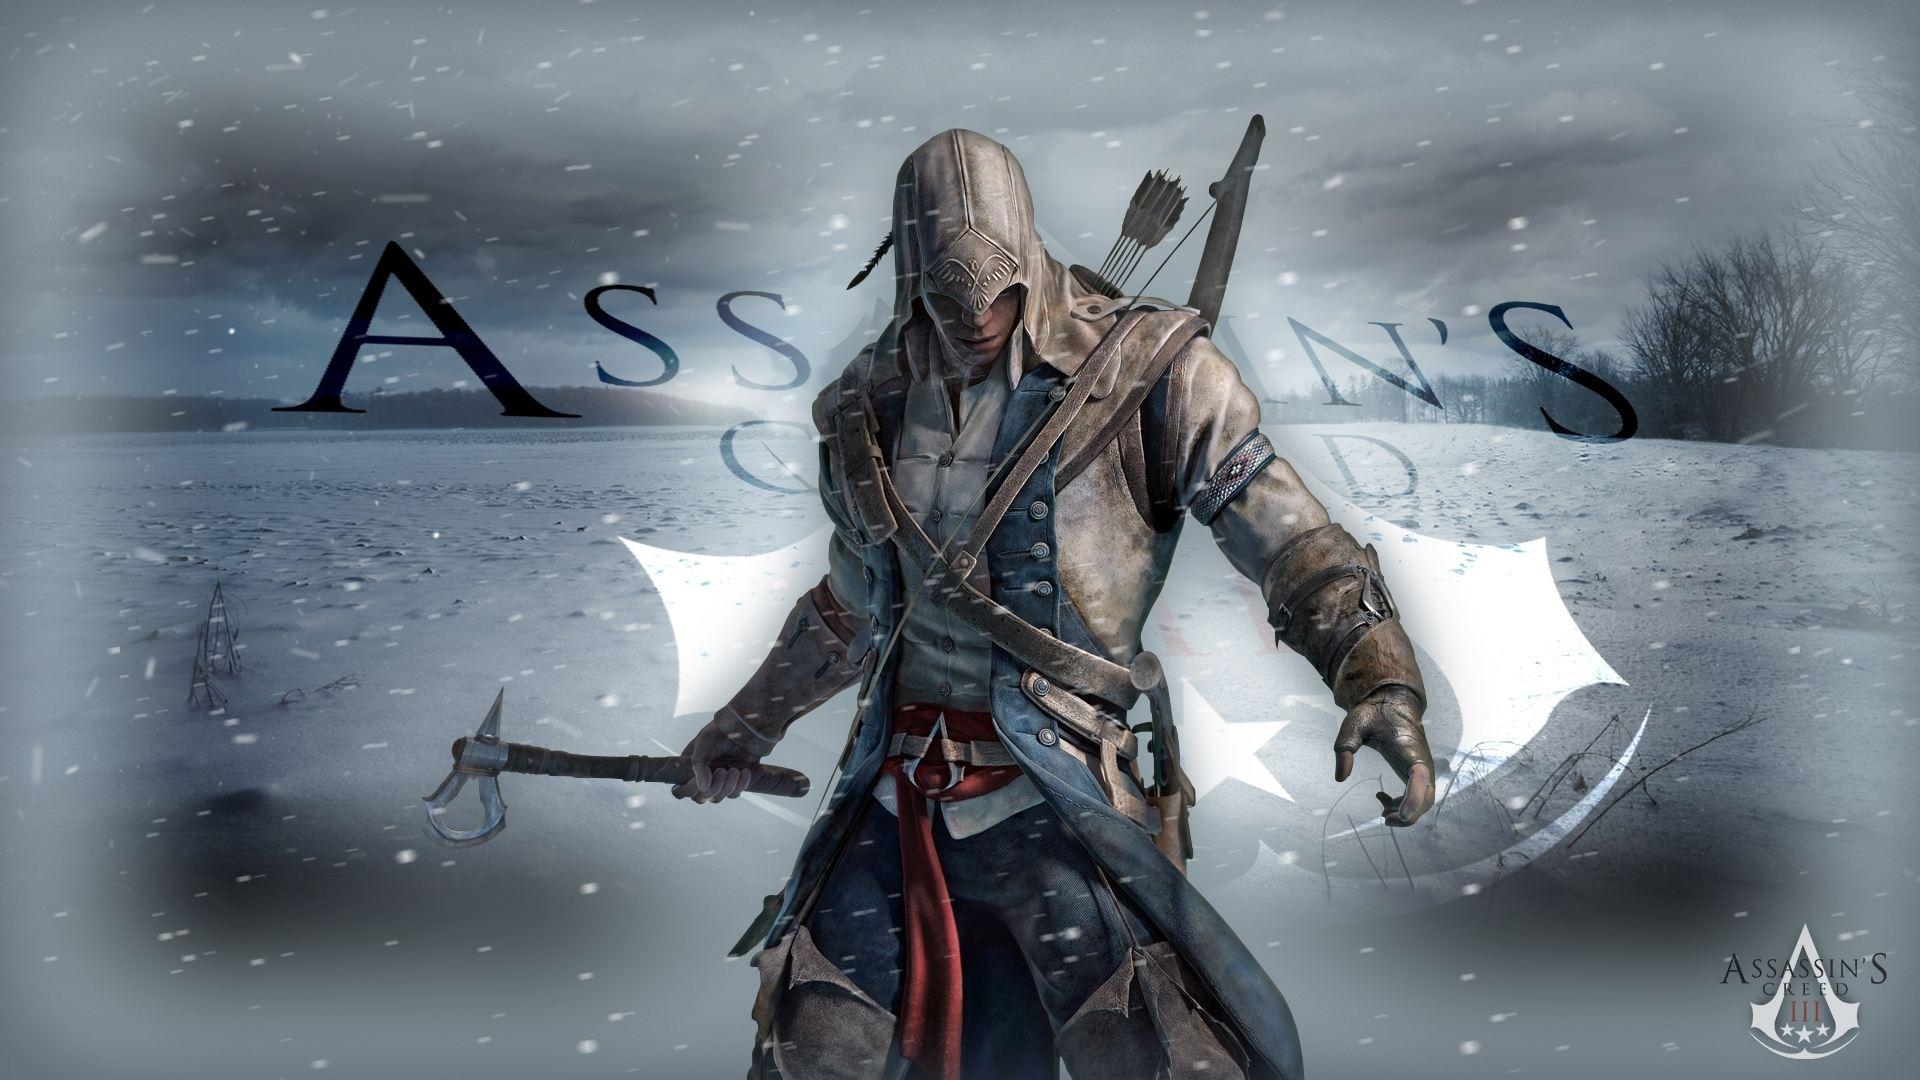 Assassins Creed 3 Wallpaper Hd 1080P   1403489 1920x1080